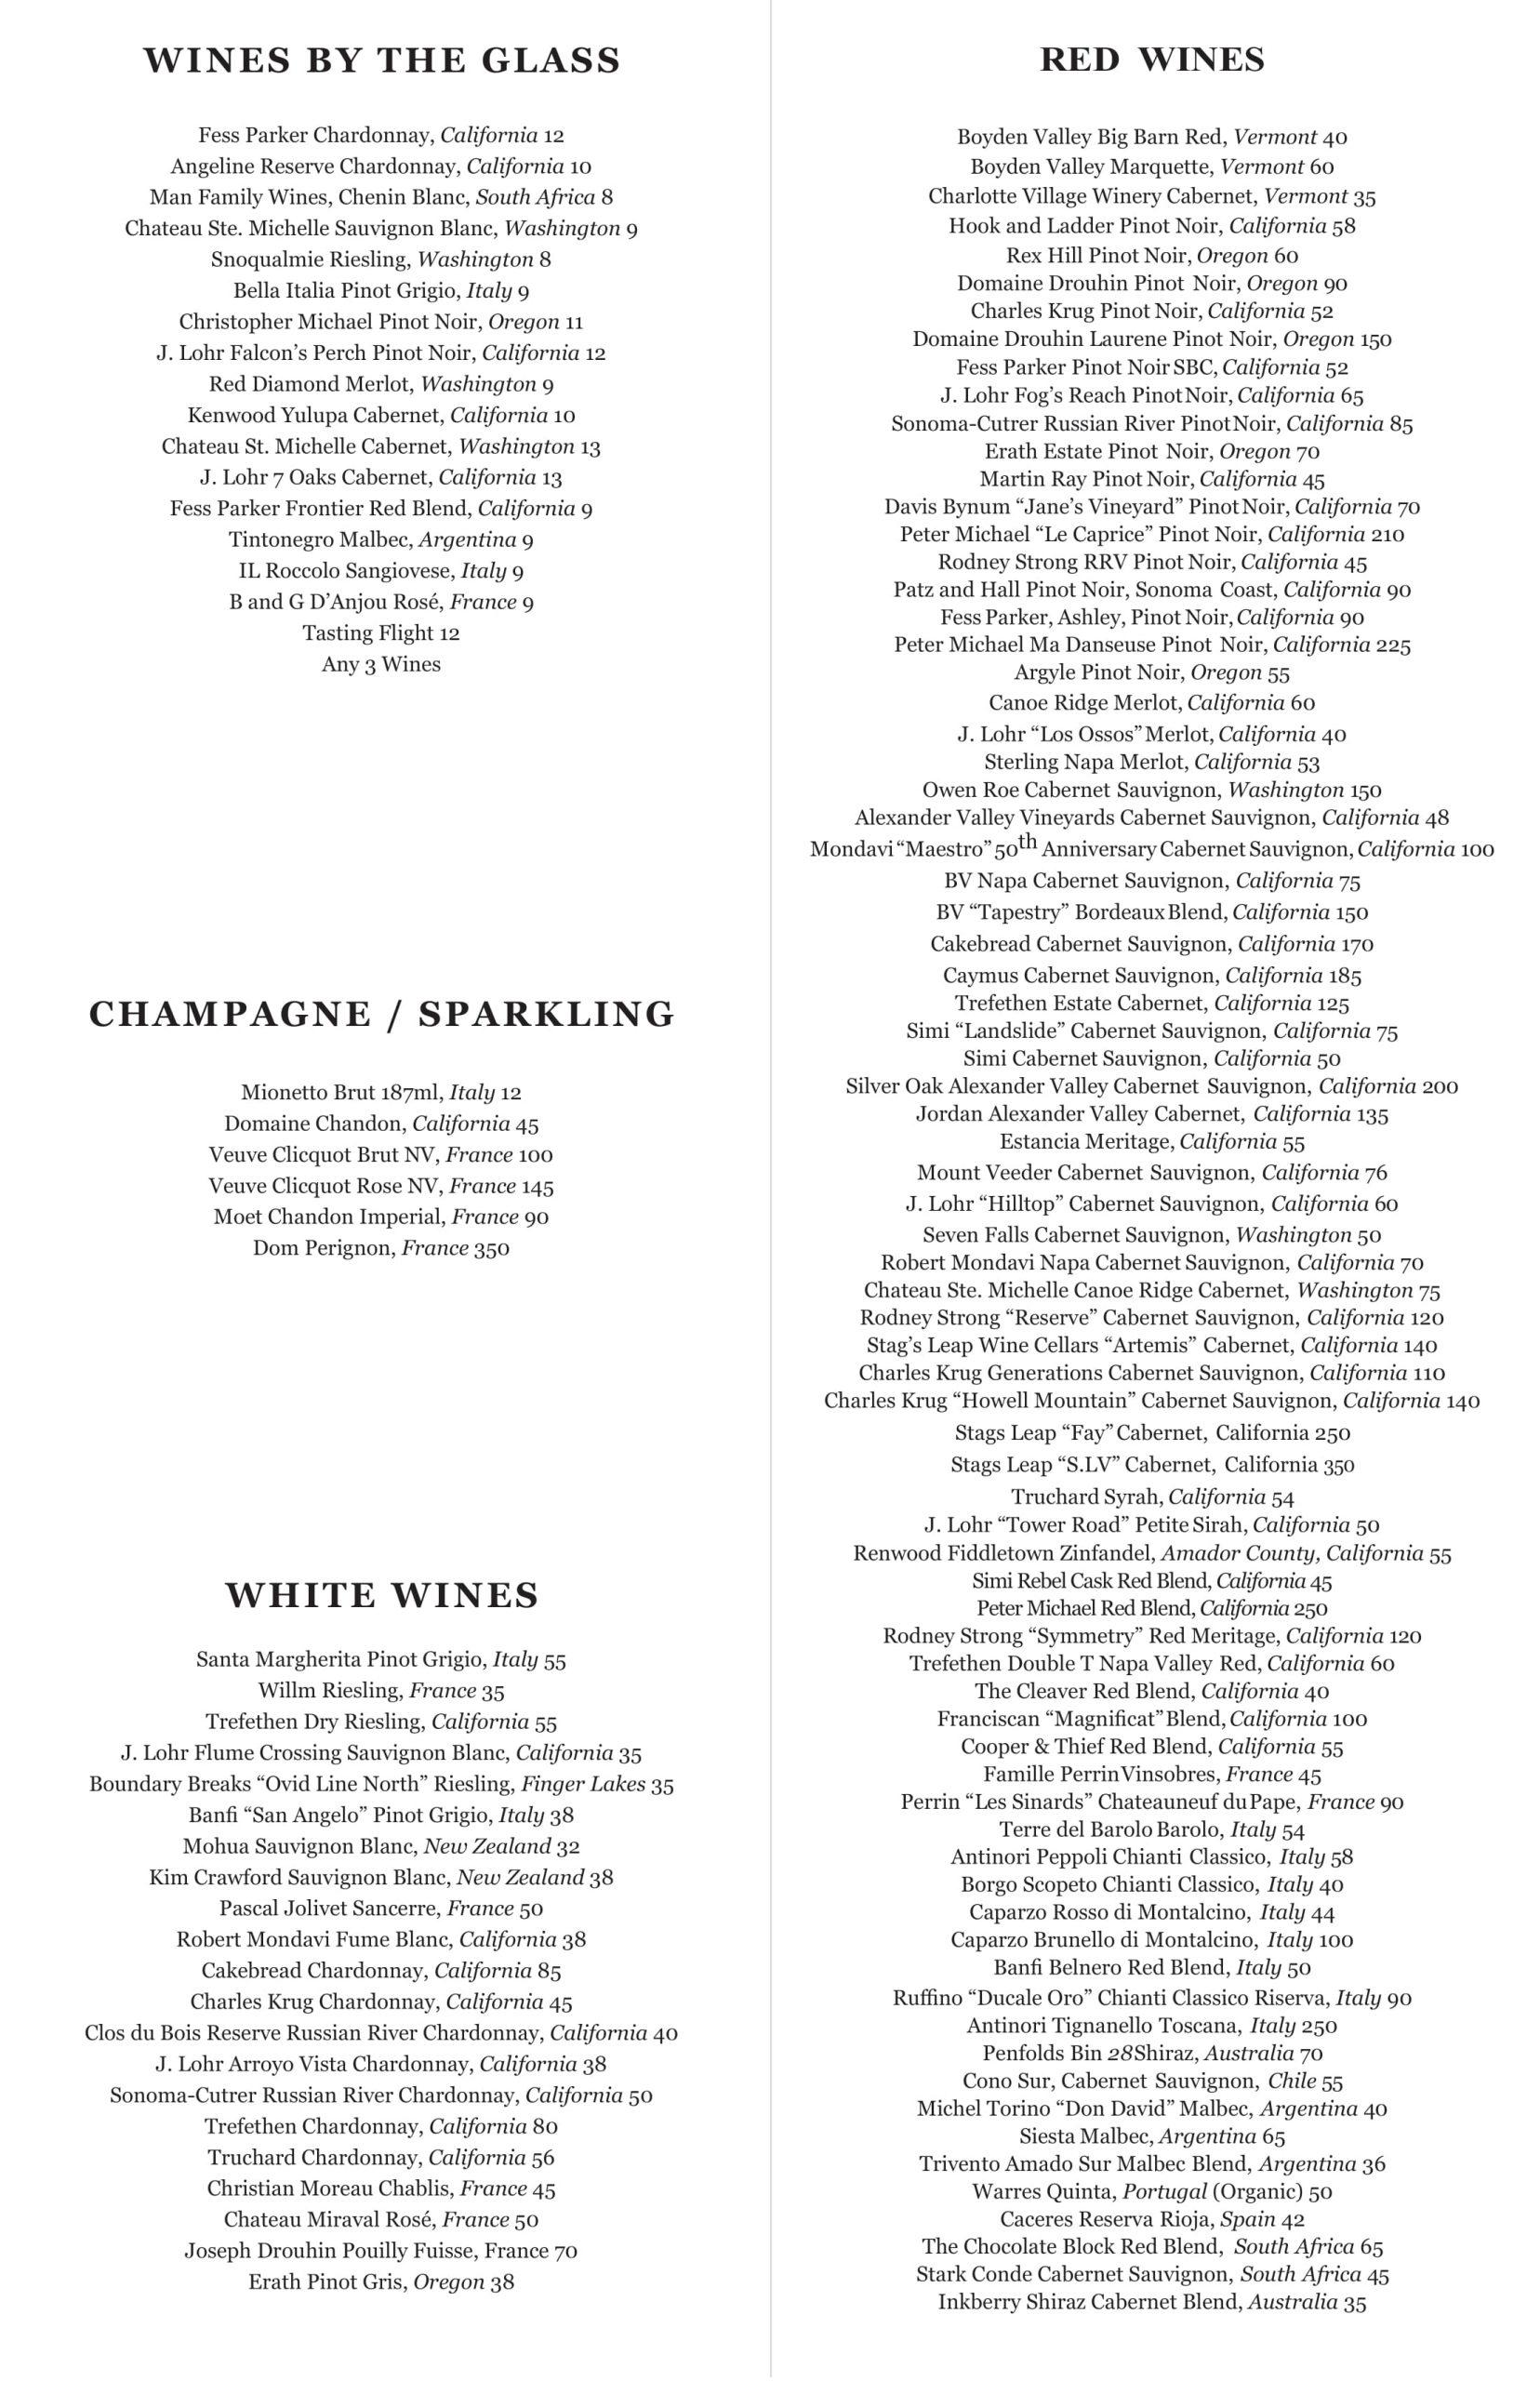 Southside wine list 4.19.21